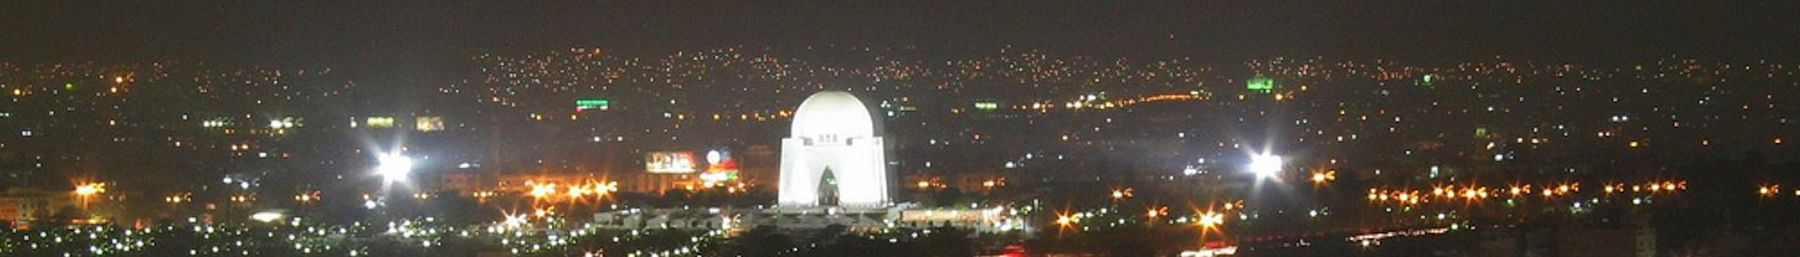 Karachi South page banner.jpg